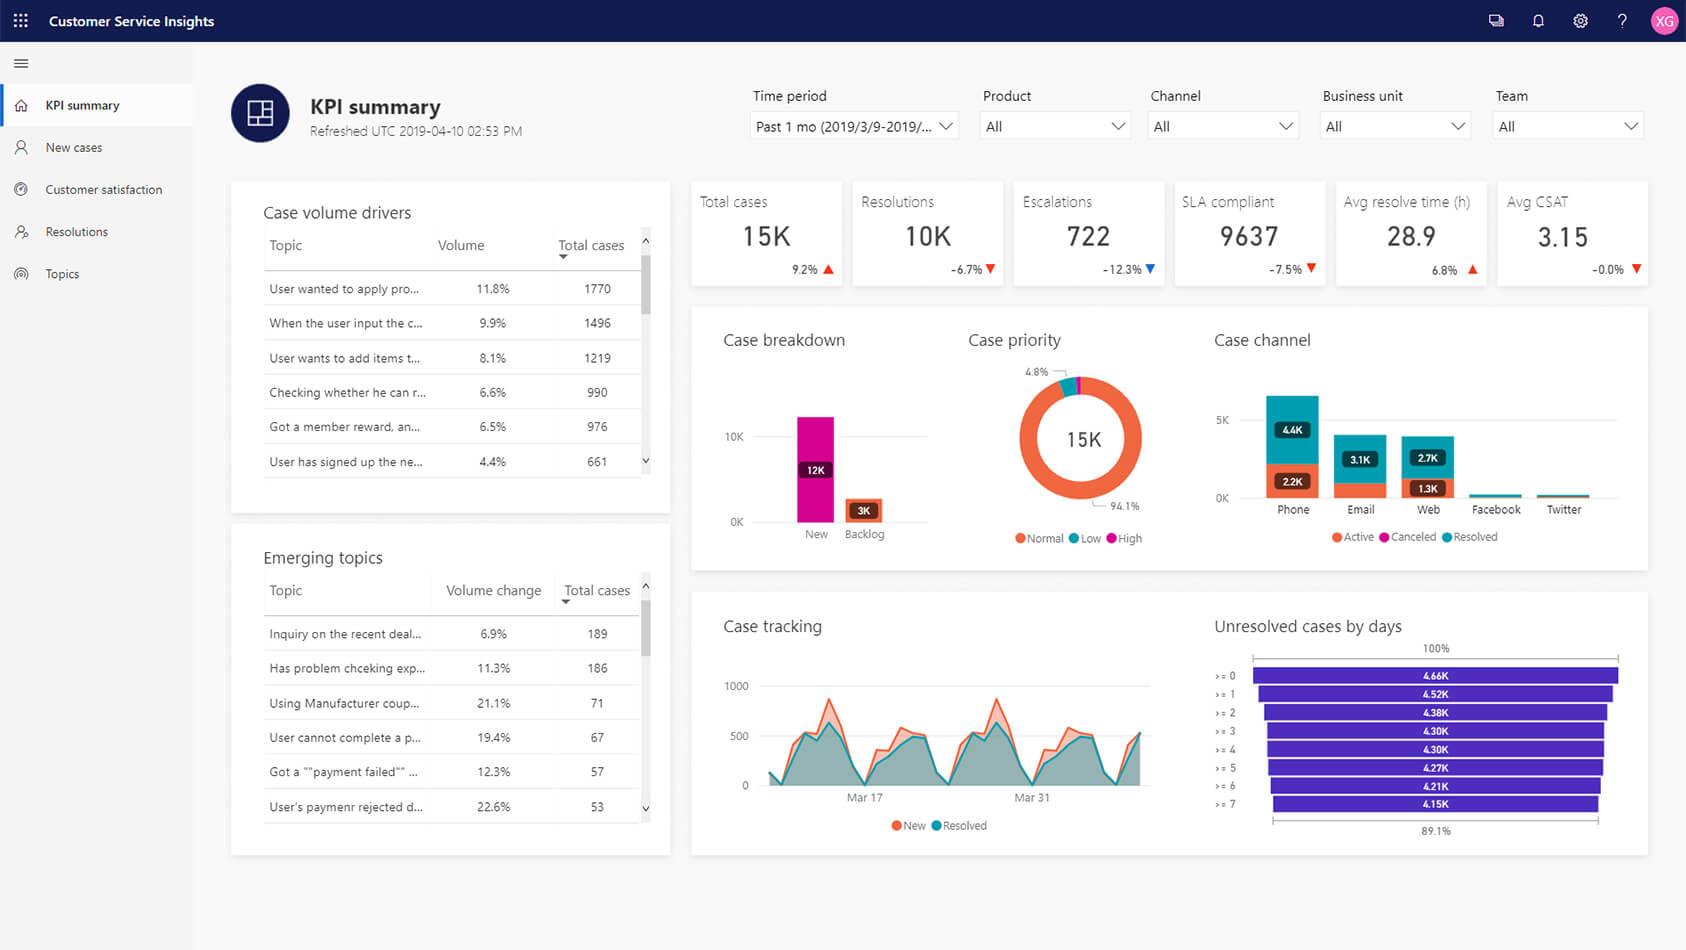 Customer Service Insights Sign In | Microsoft Dynamics 365